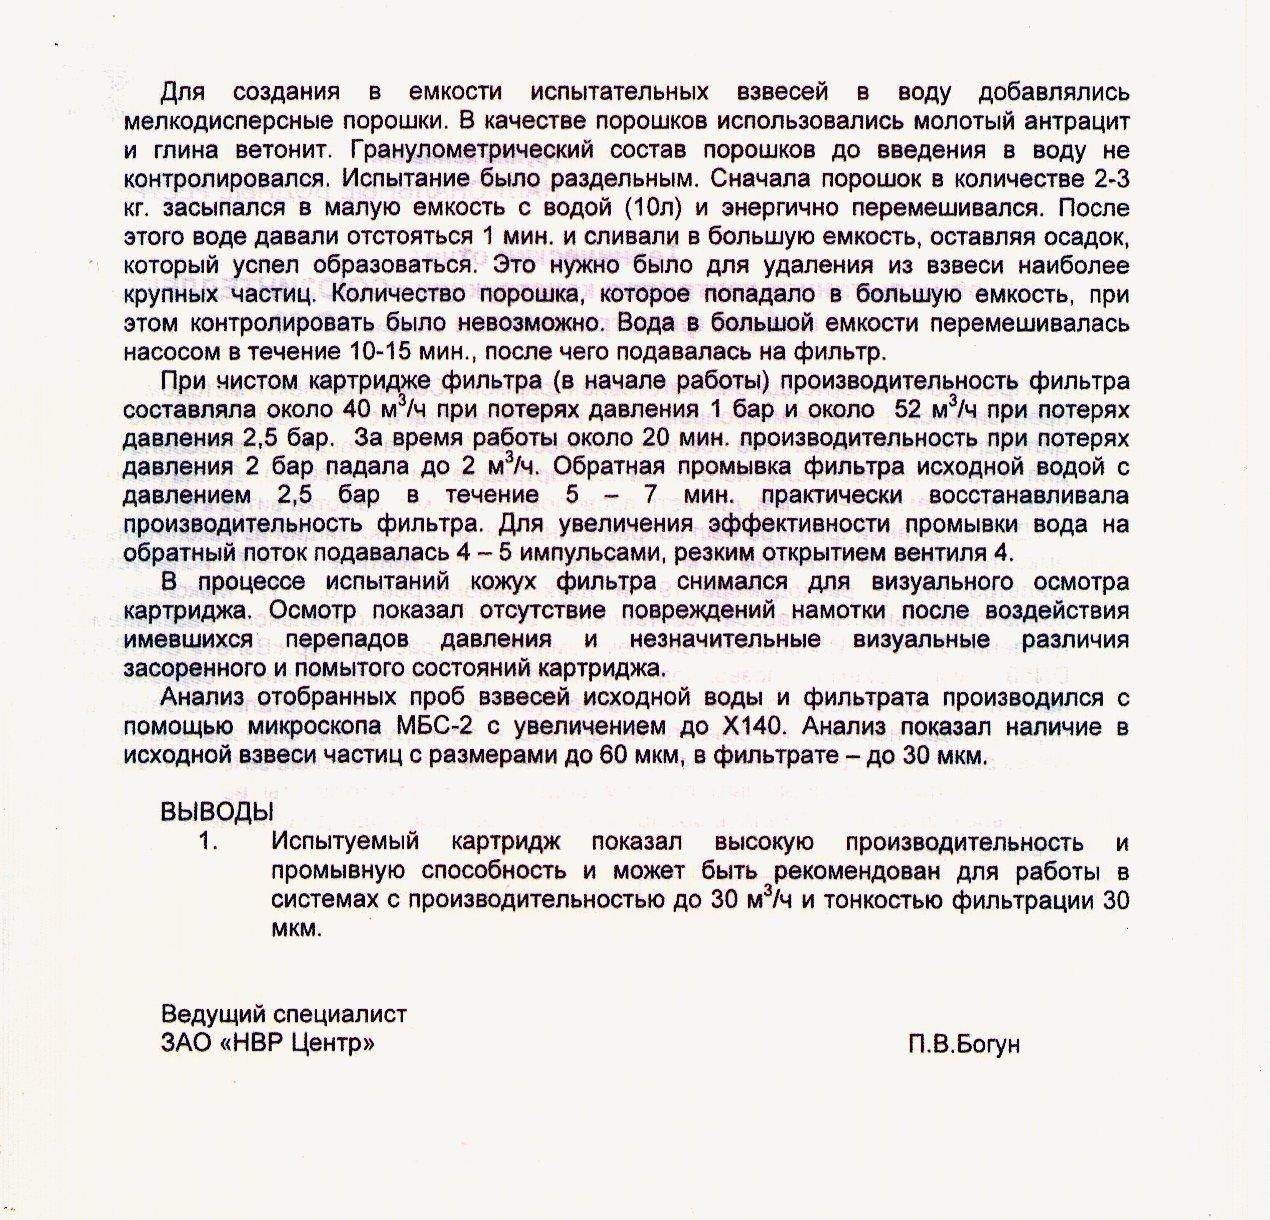 http://souzintellekt.ru/images/upload/fs60-2.jpg